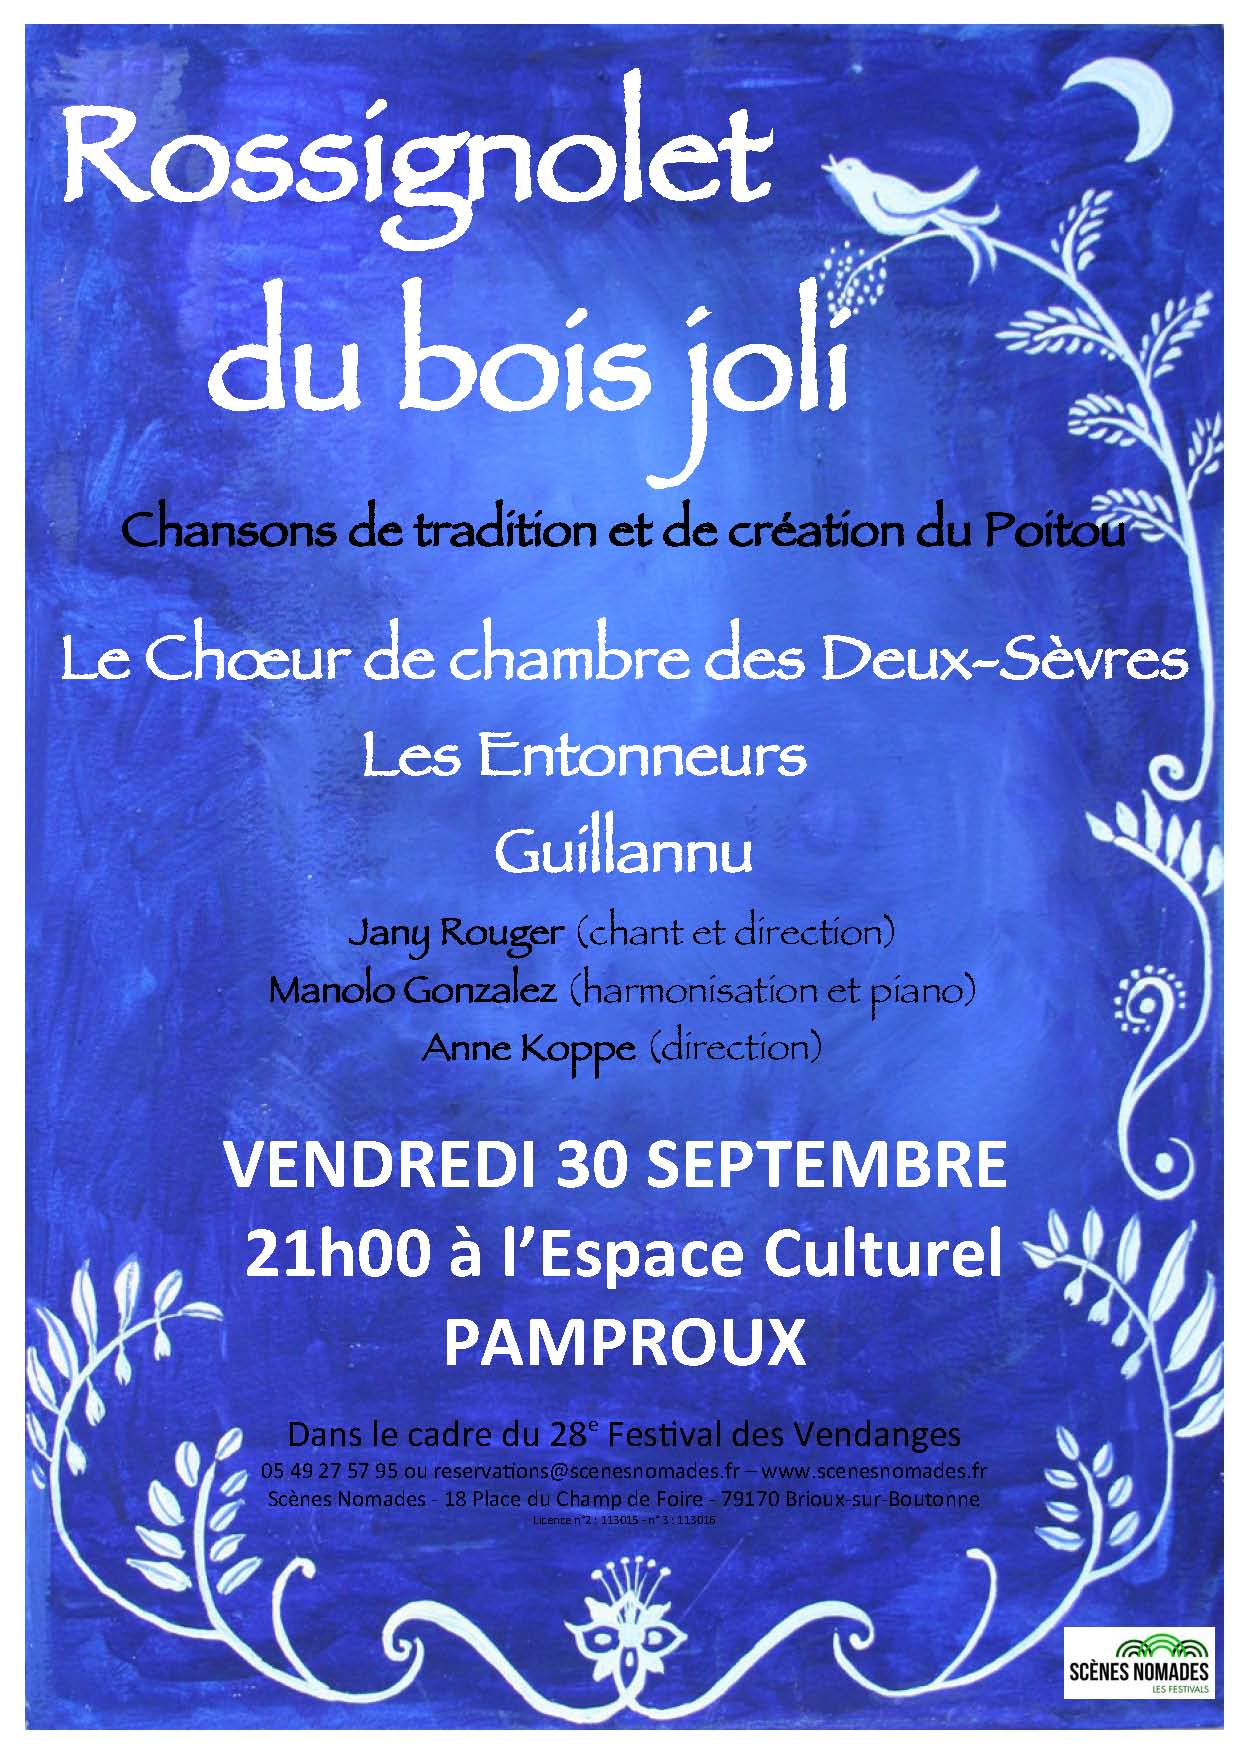 rossignolet-pamproux-30-sept-2014